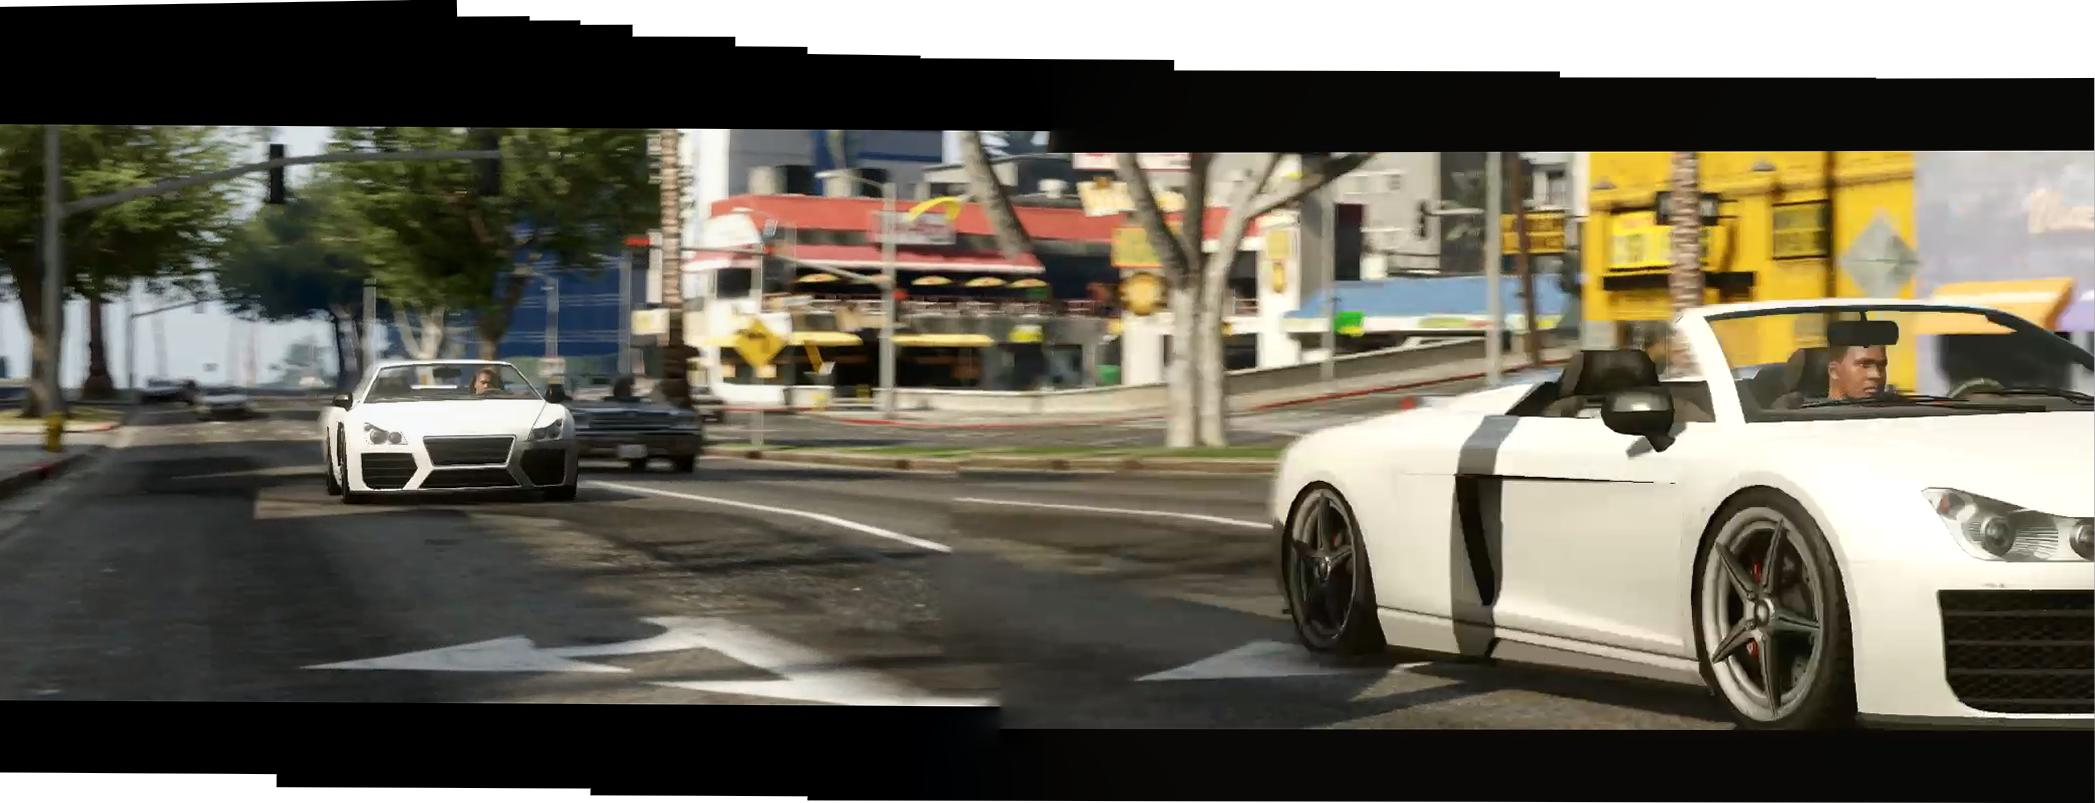 panorama_07 - Grand Theft Auto 5